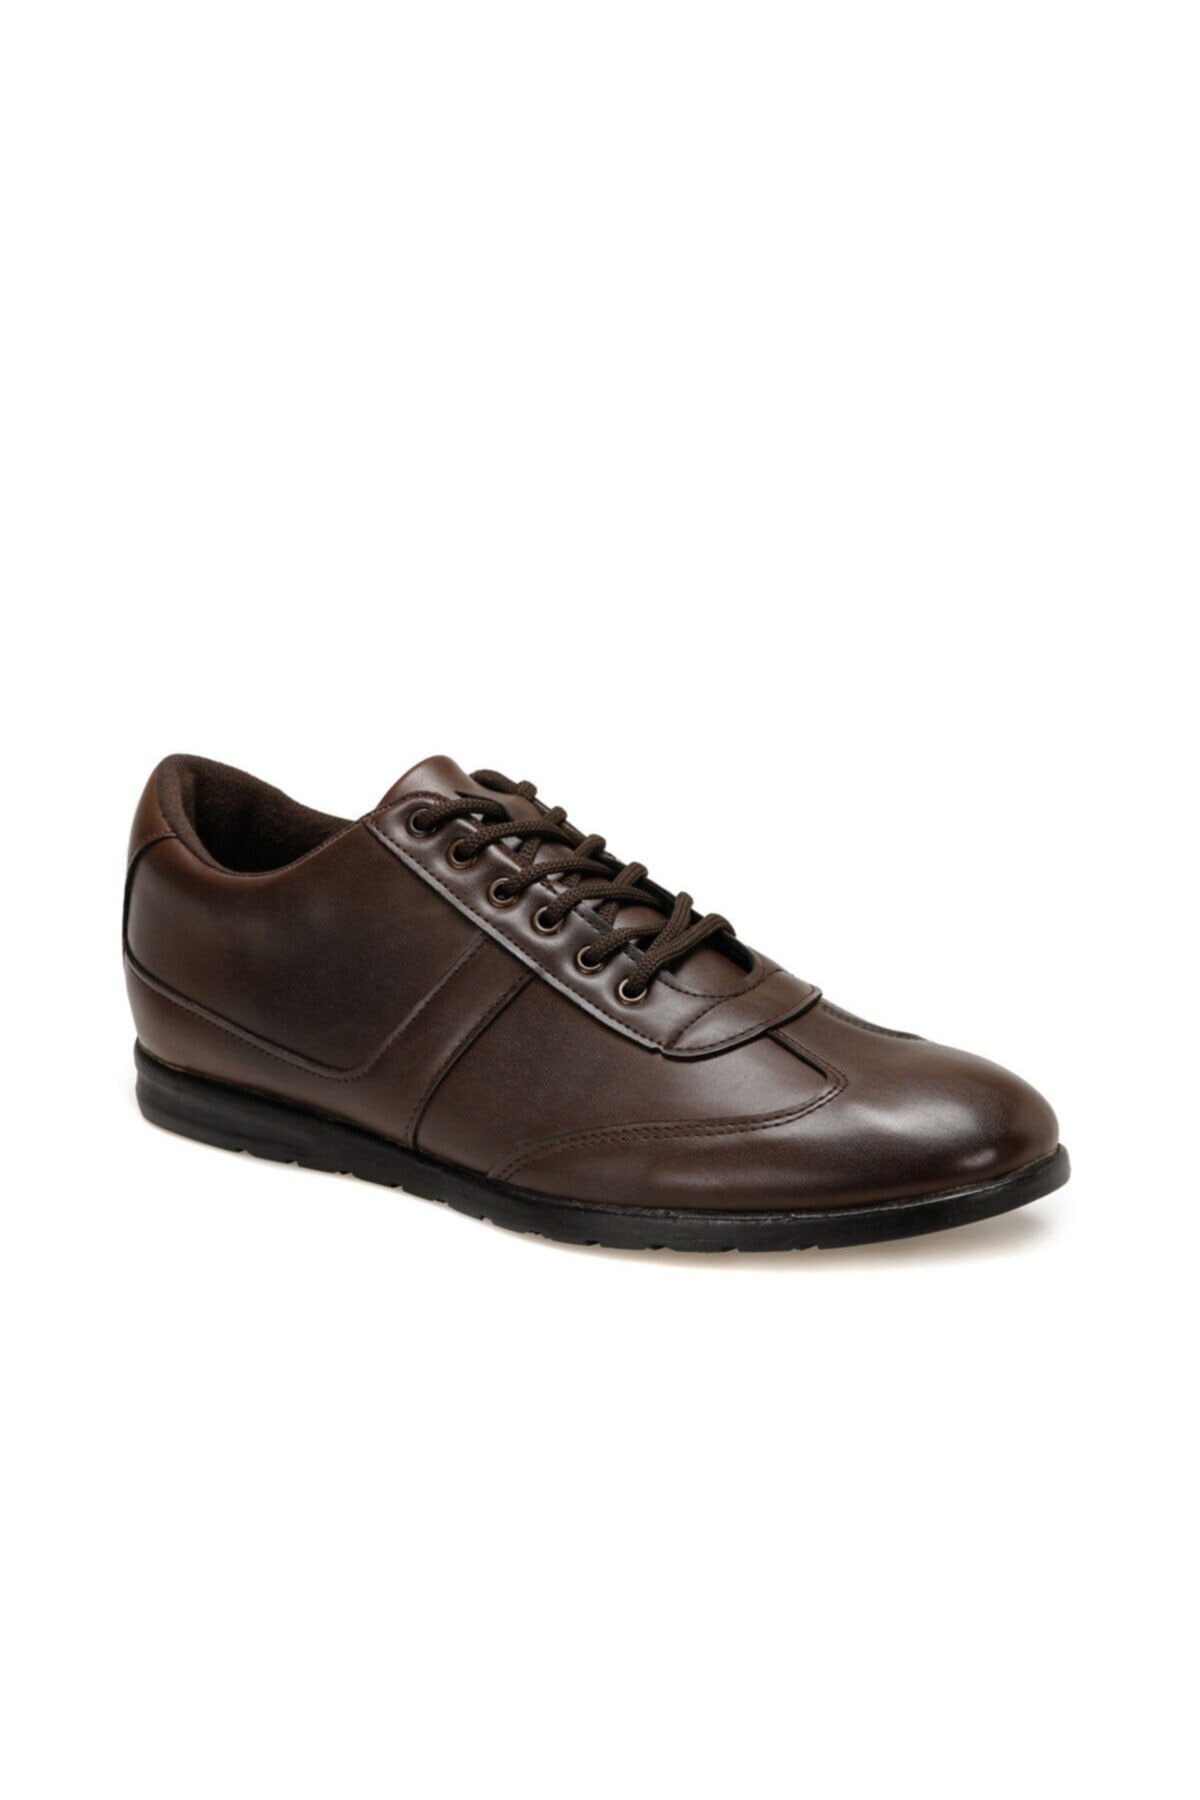 OXIDE GBS118 Kahverengi Erkek Casual Ayakkabı 100521546 1